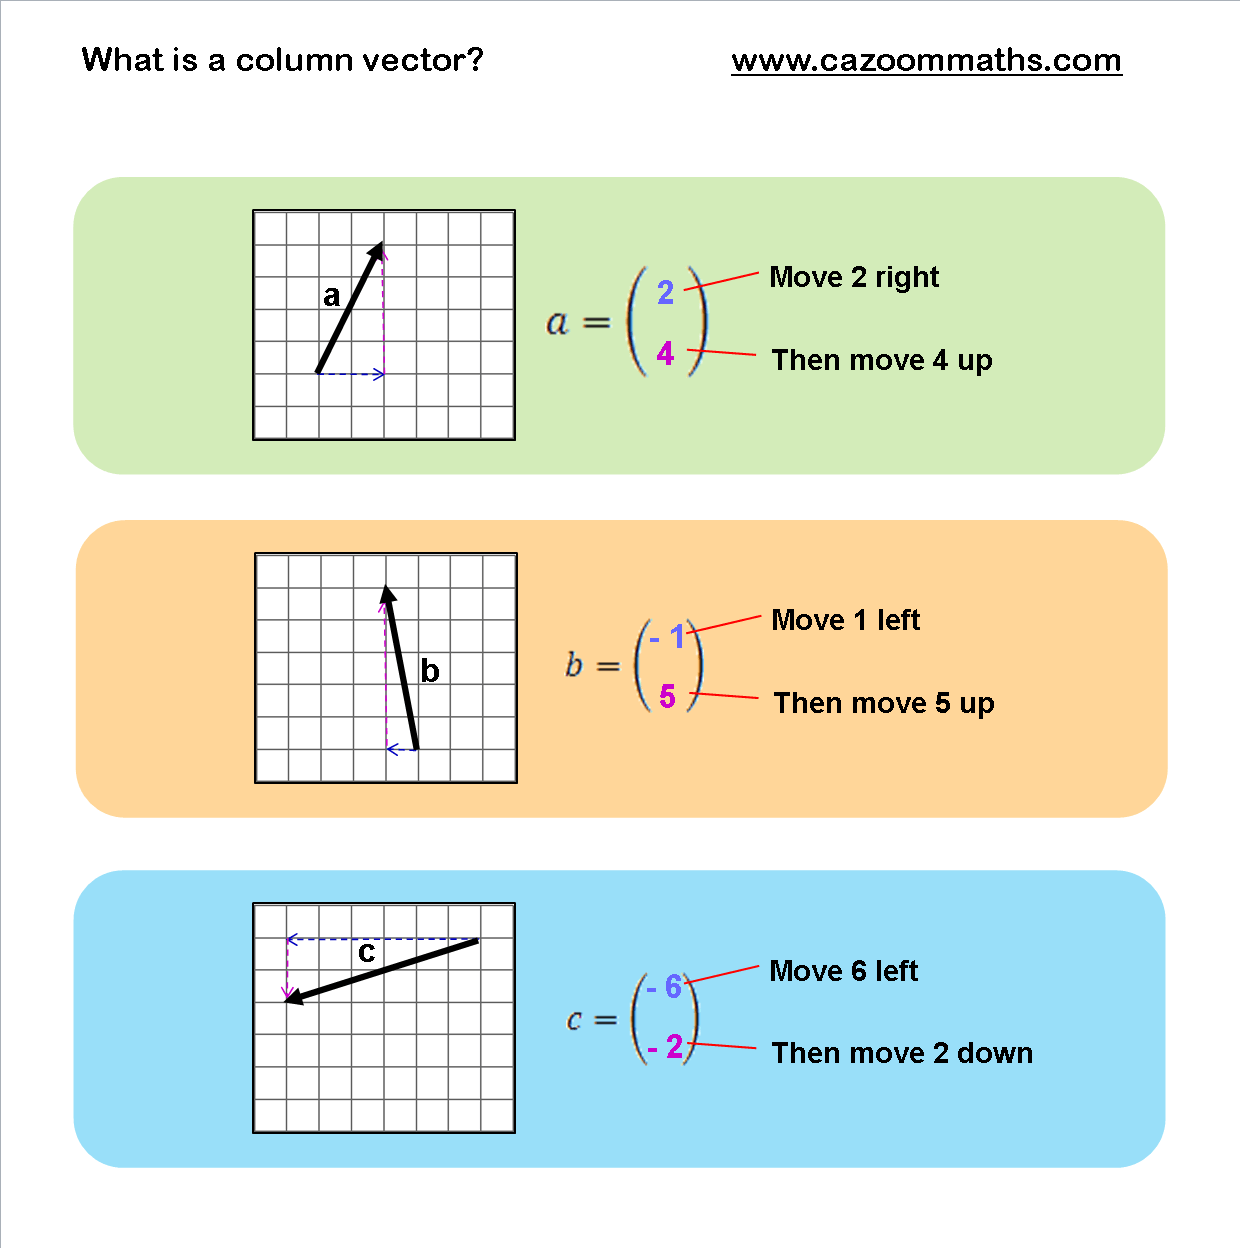 Niedlich Mathe GCSE Arbeitsblatt Bilder - Mathe Arbeitsblatt ...